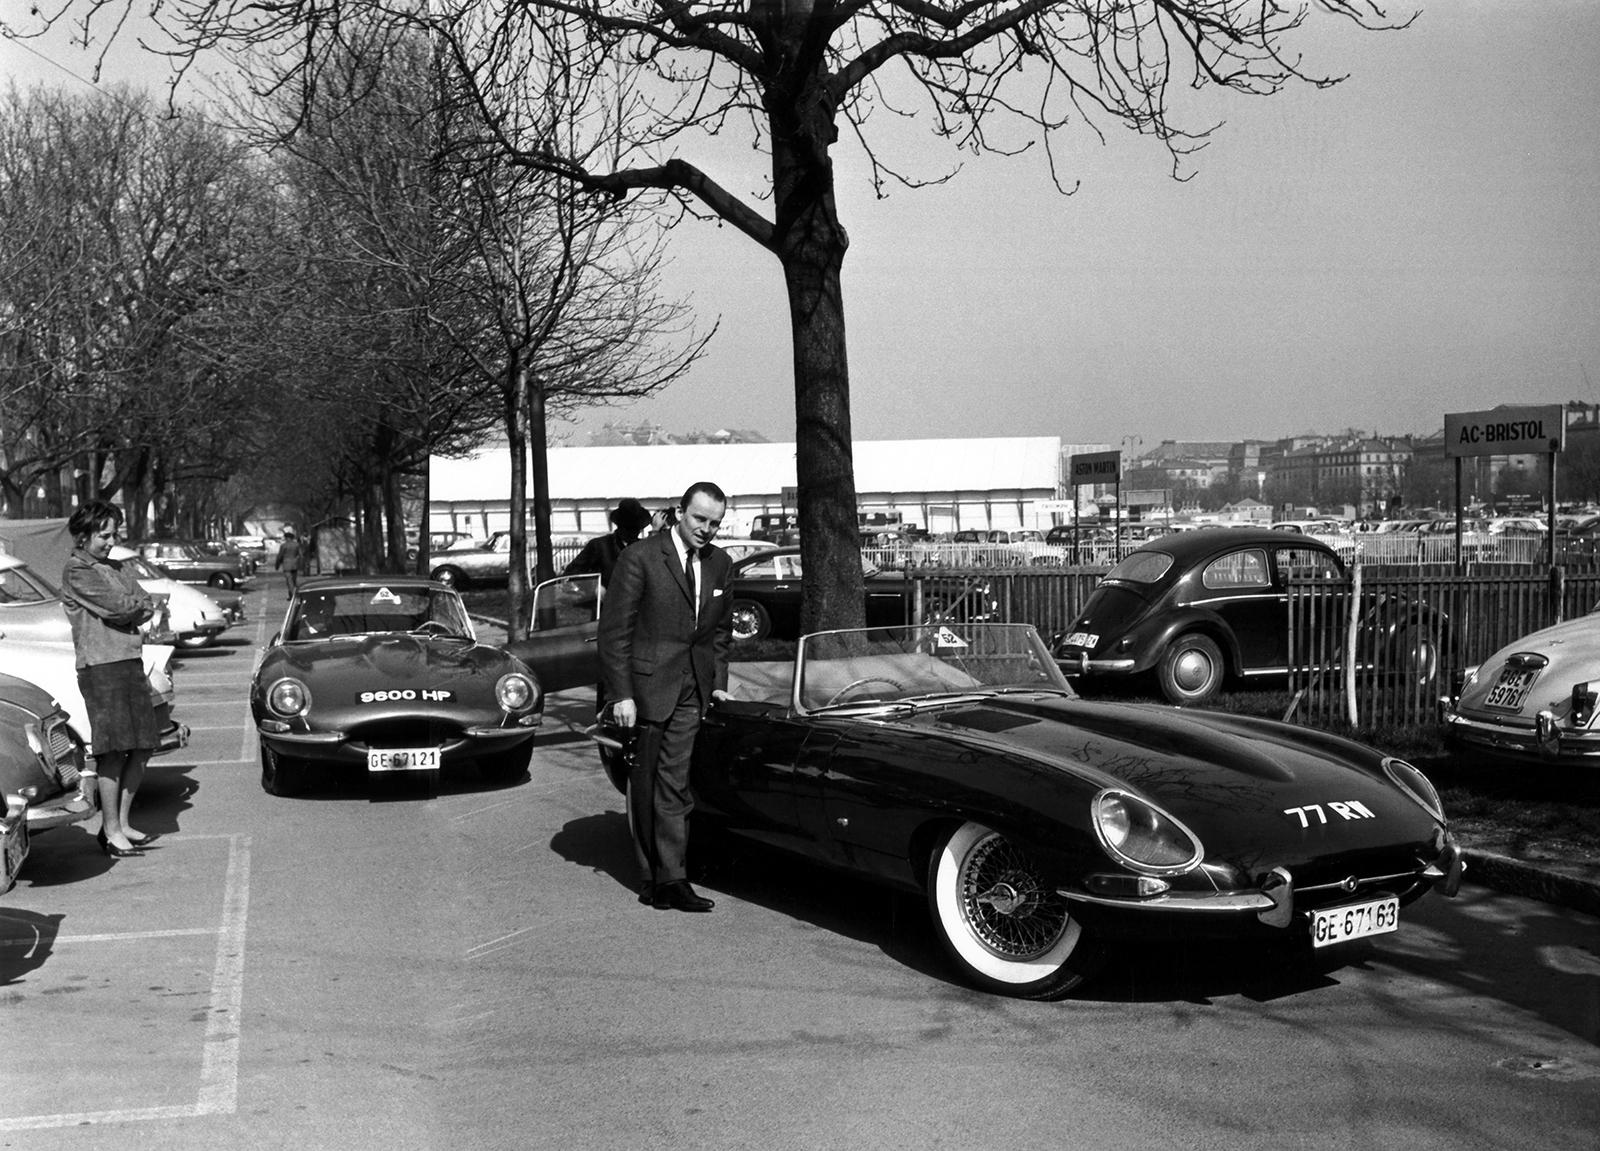 1961 Jaguar E-Type Roadster 850003 77RW